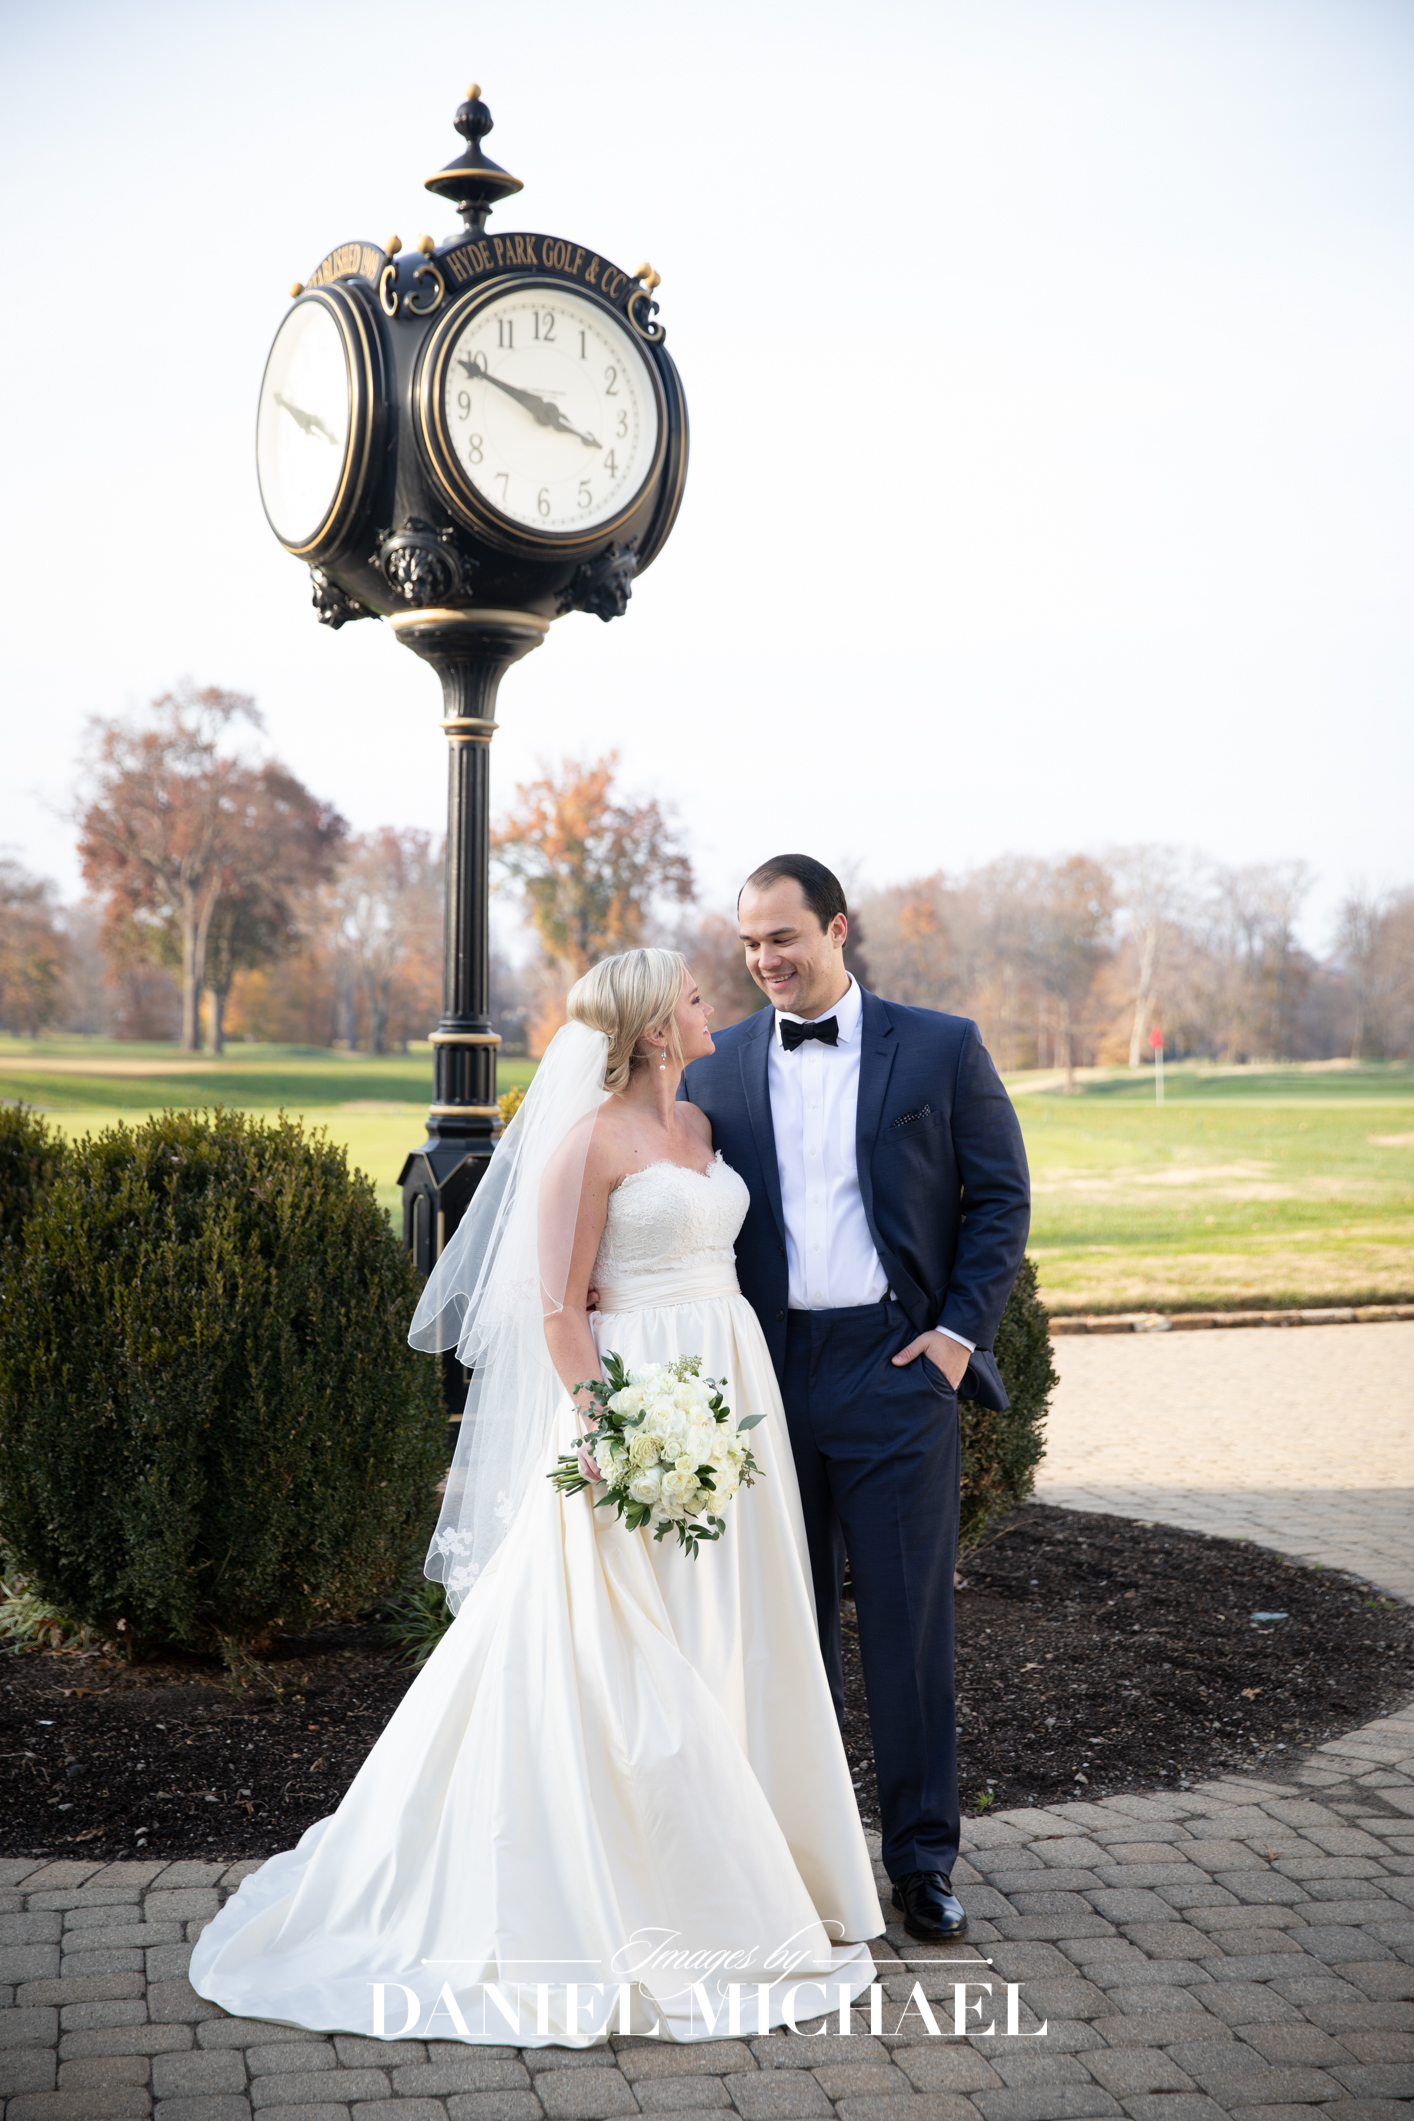 Hyde Park Country Club Wedding Venue Photographer Reception